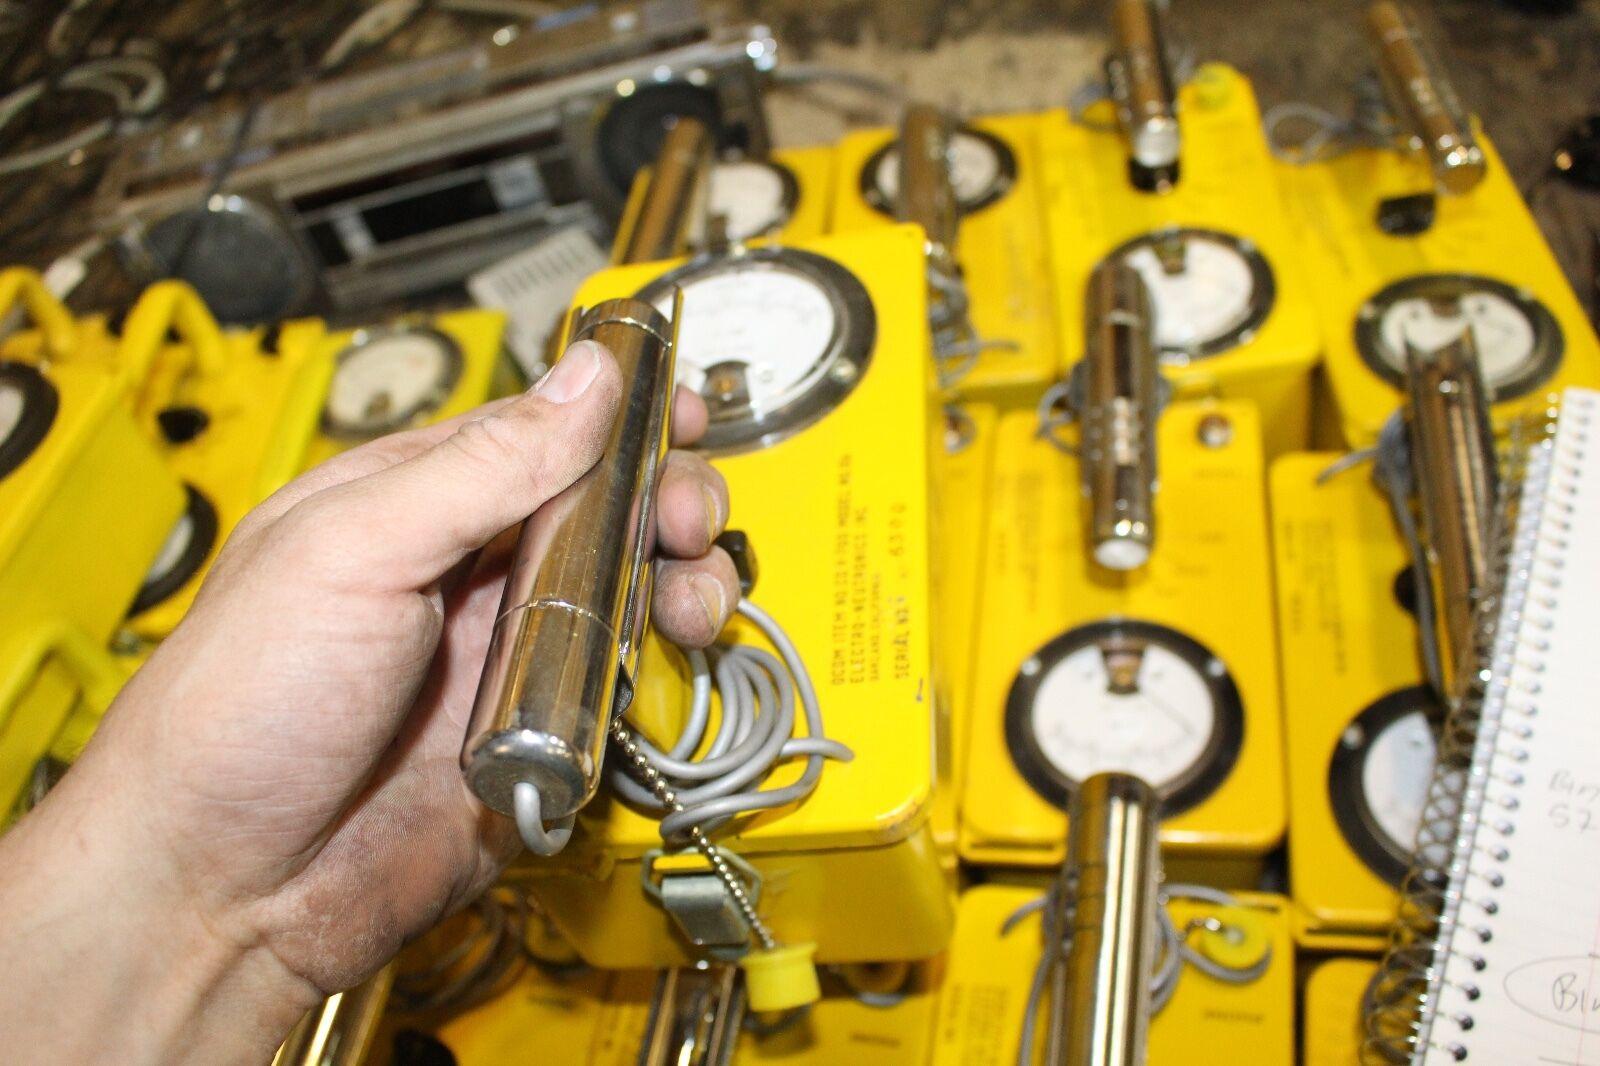 s l1600 - Civil Defense Electro Neutronics CDV-700 CD V-700 Geiger Counter